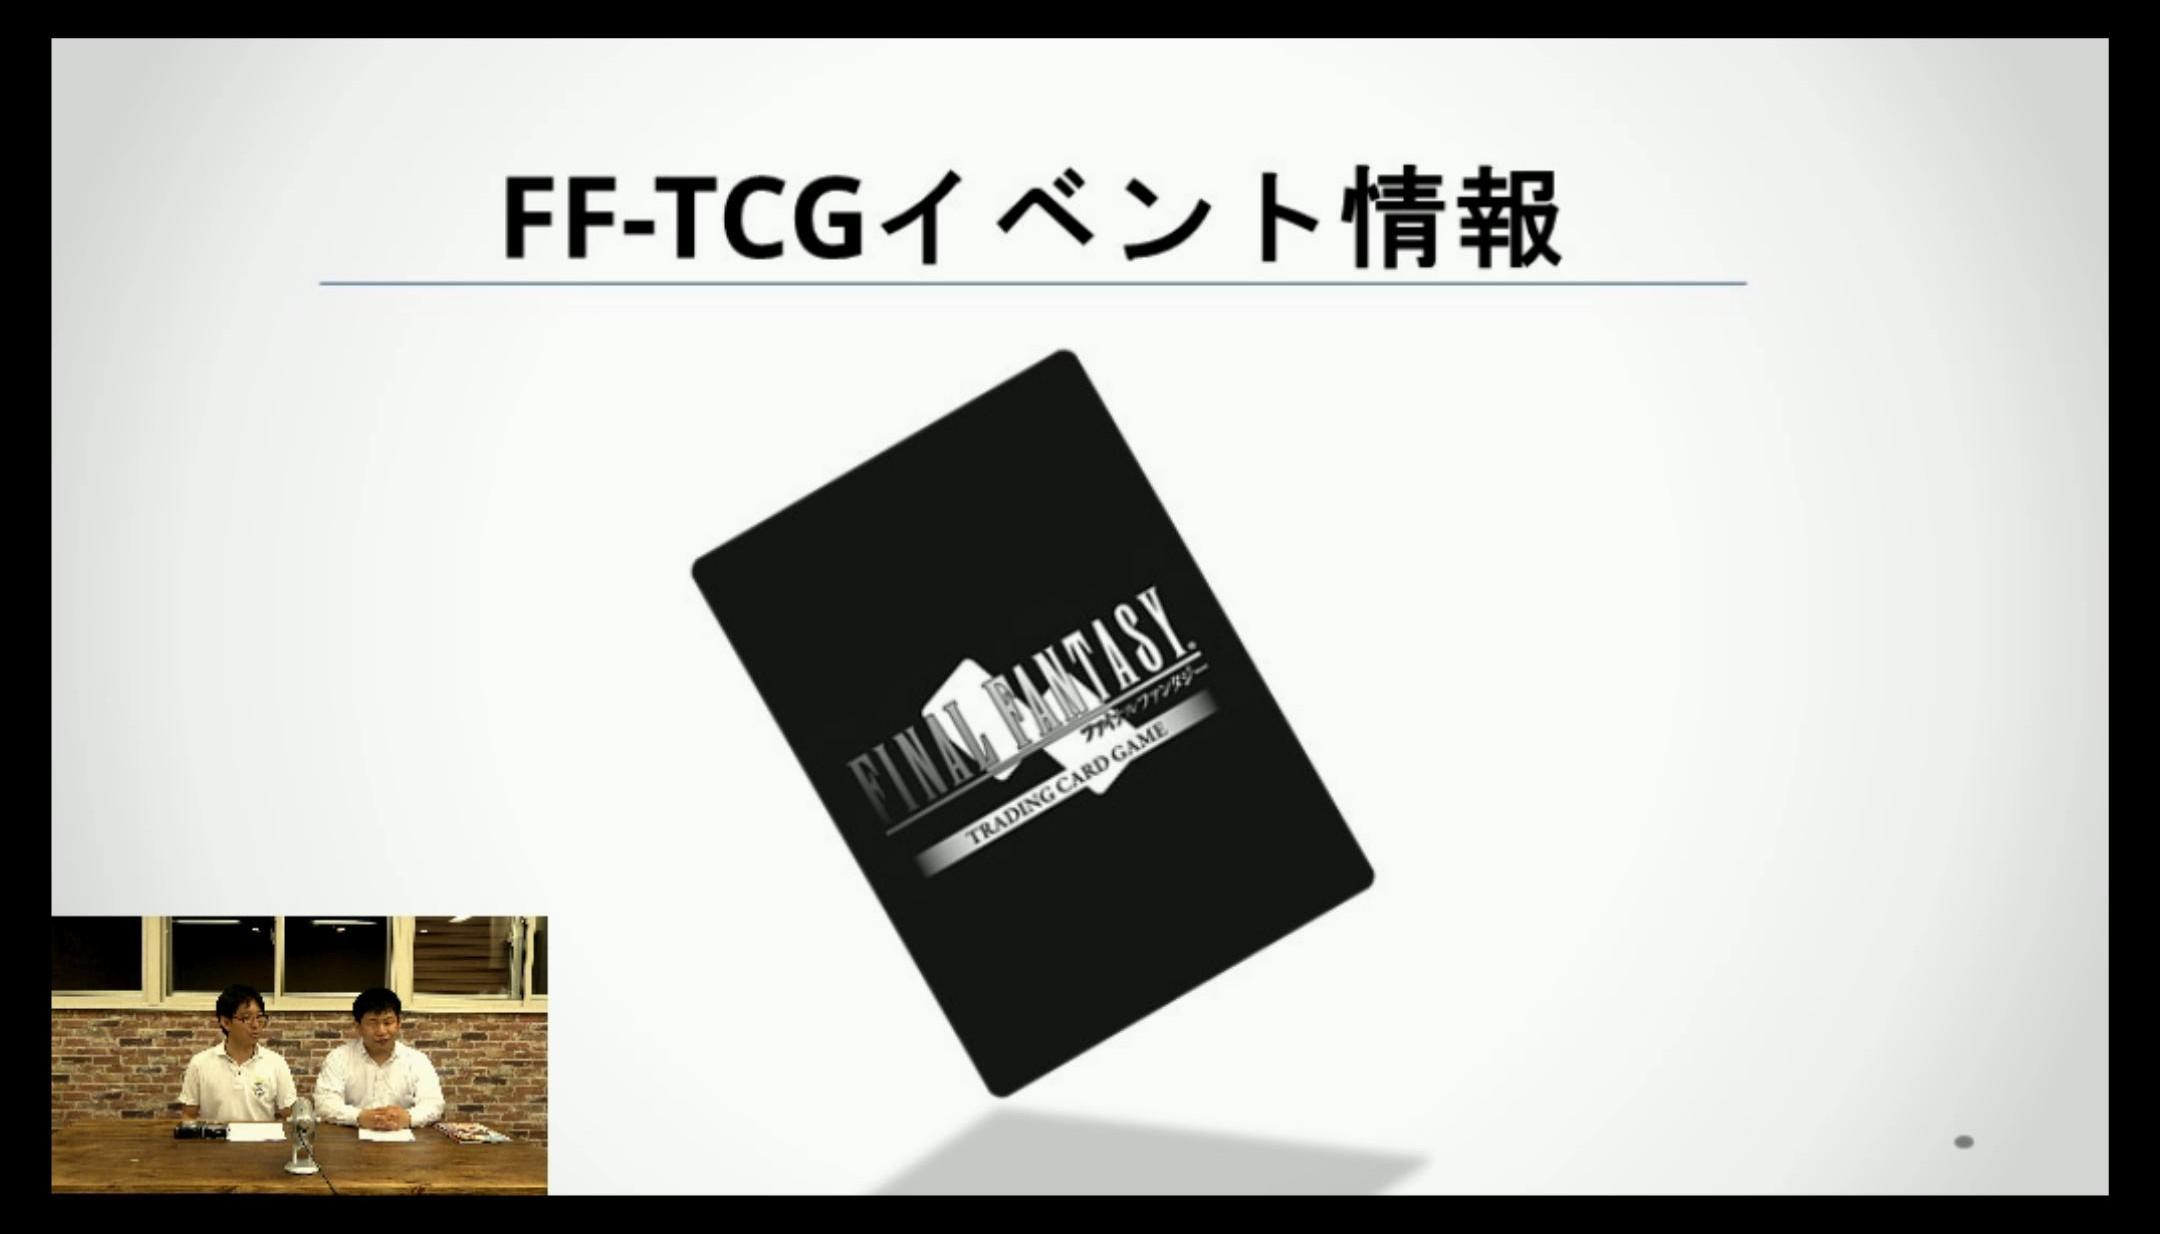 fftcg-live-170531-004.jpg